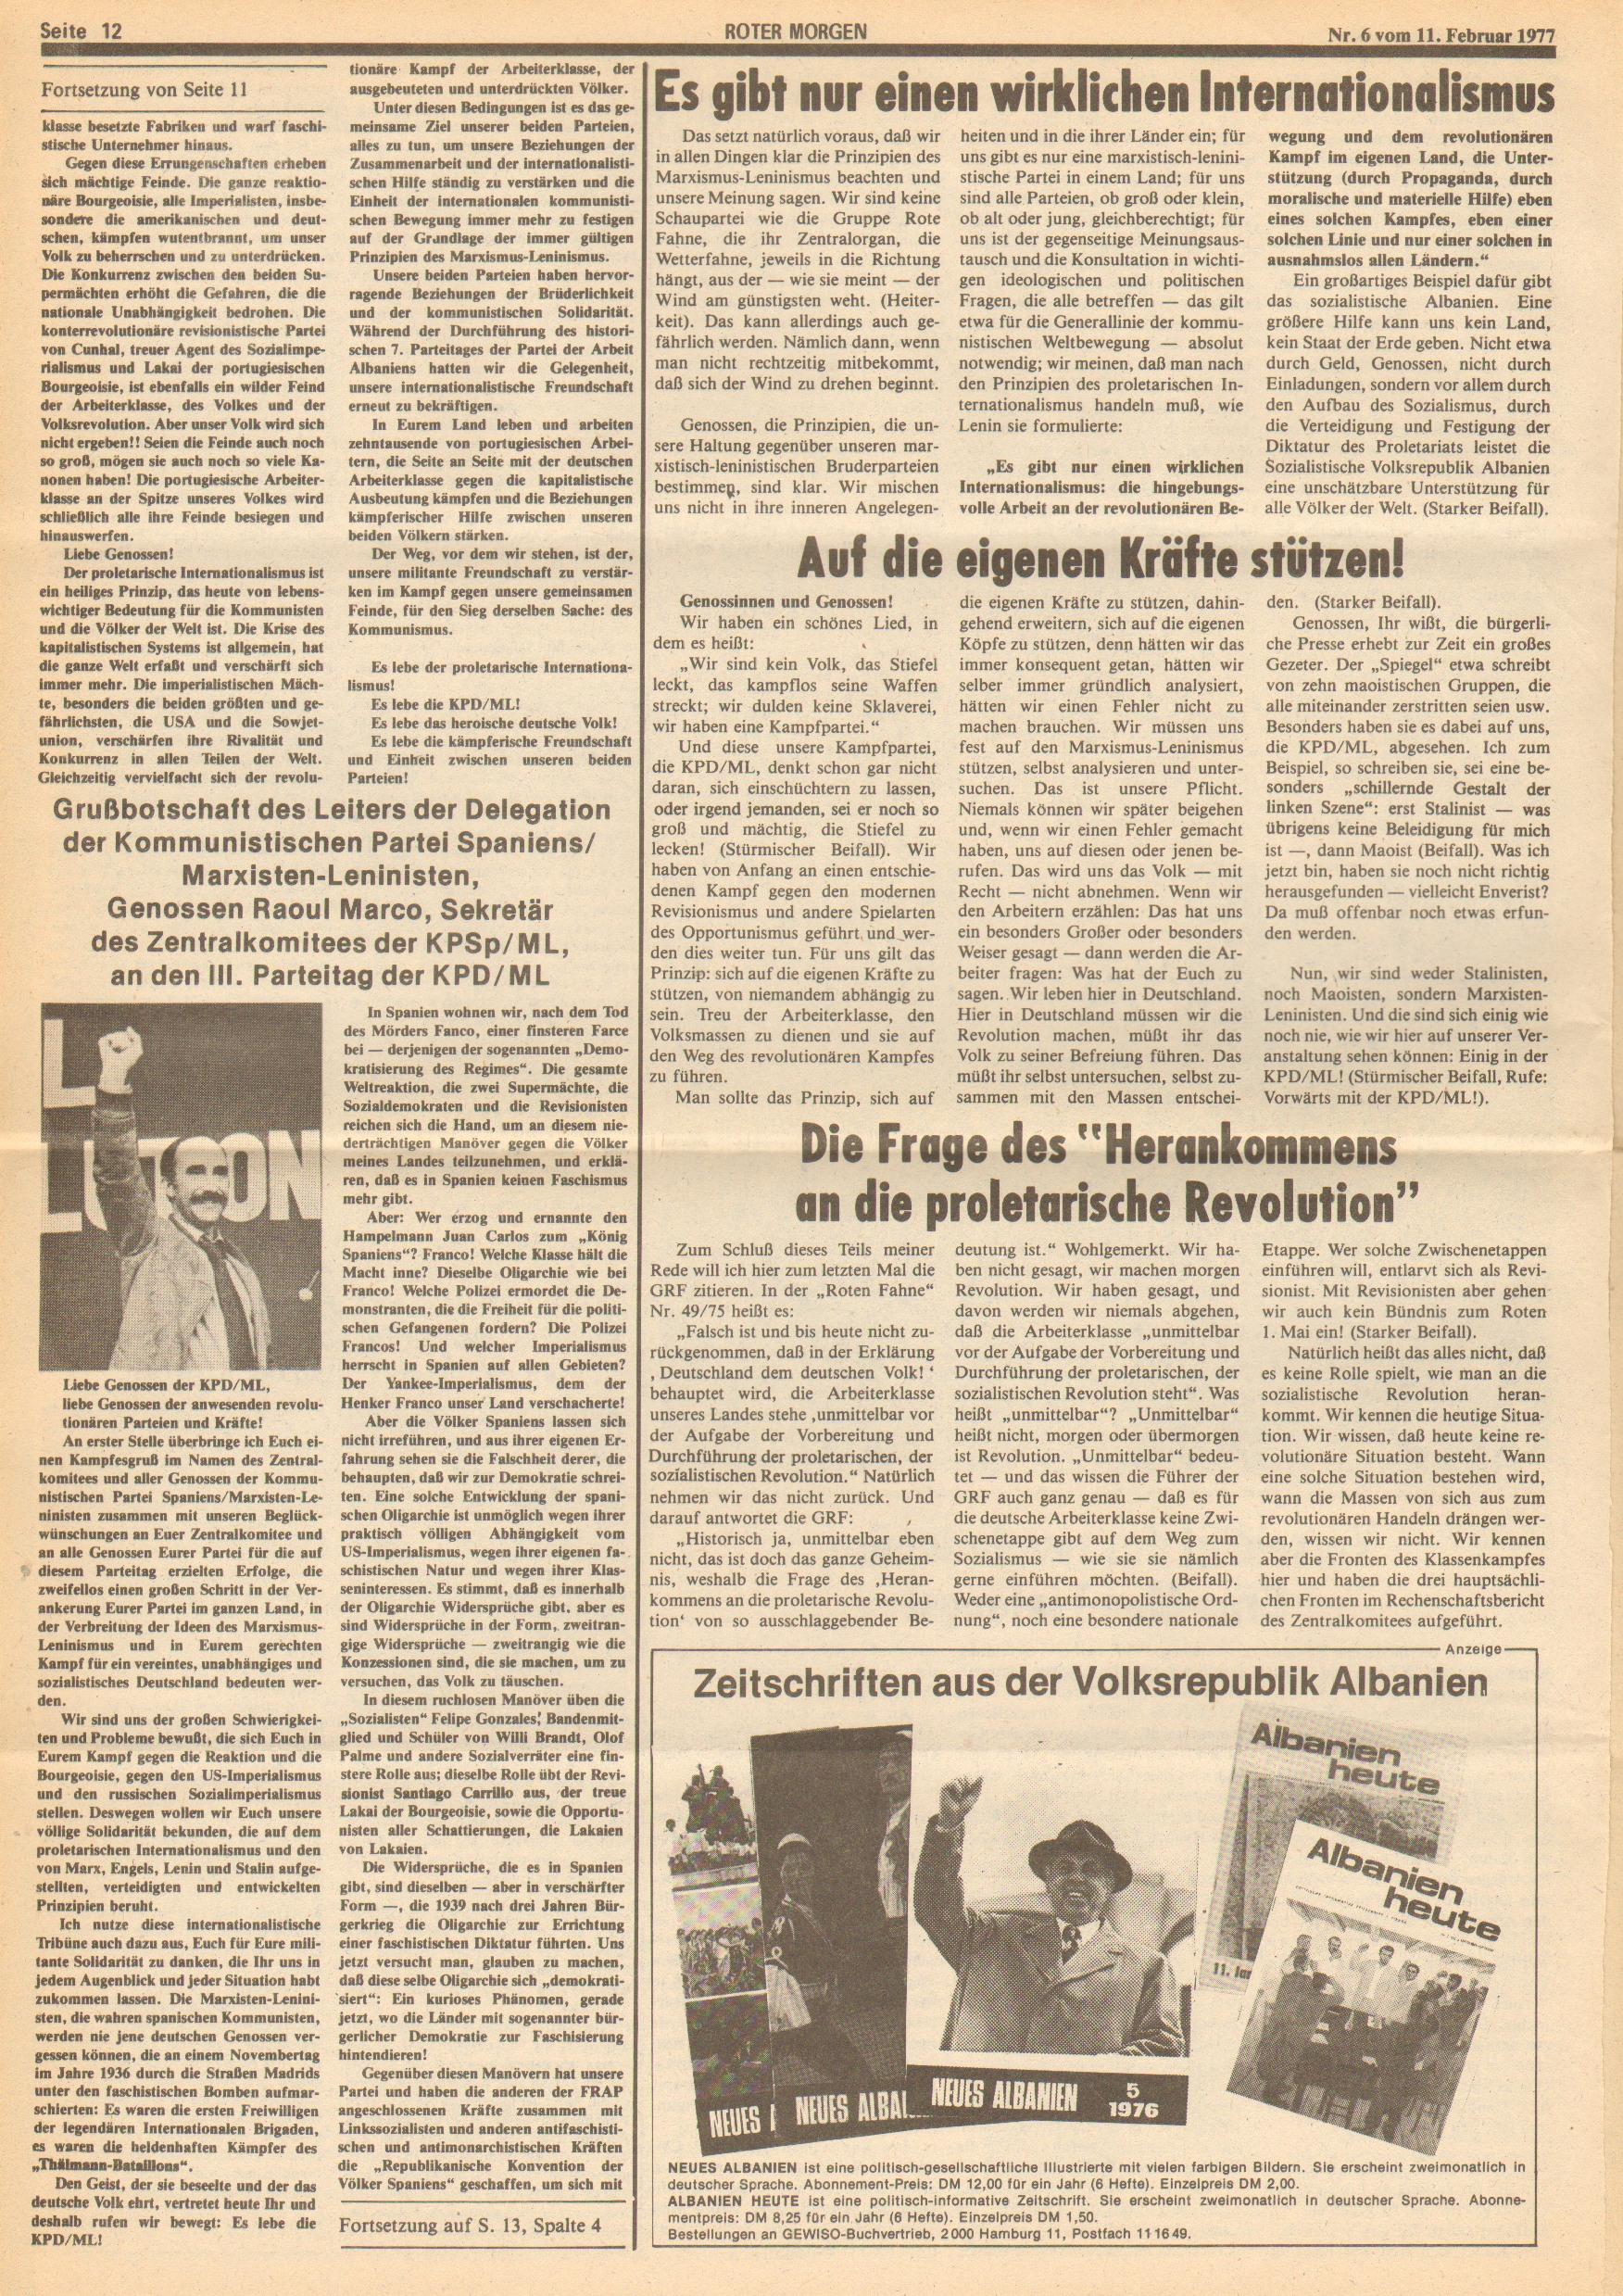 Roter Morgen, 11. Jg., 11. Februar 1977, Nr. 6, Seite 12